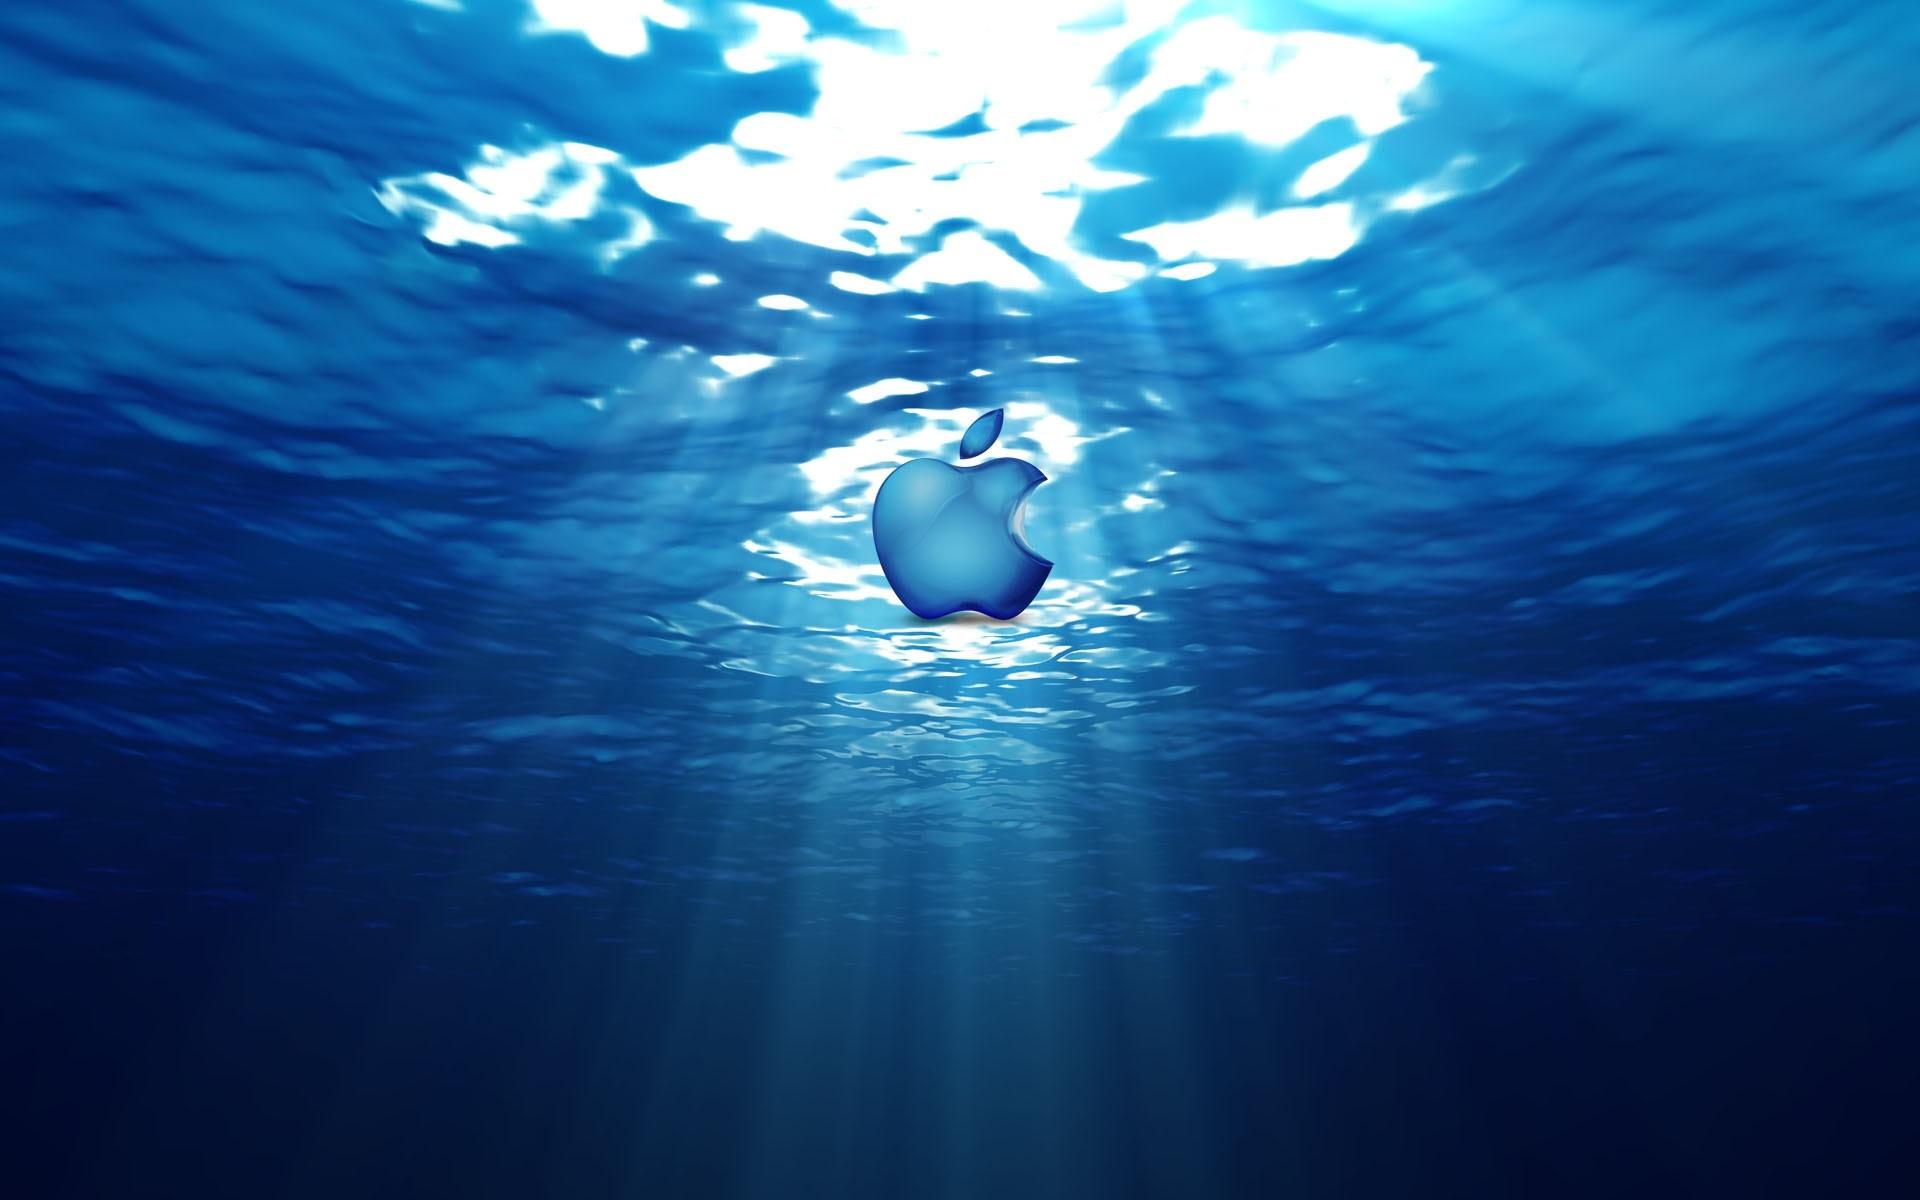 Unduh 6000 Wallpaper Apple Laptop HD Gratis